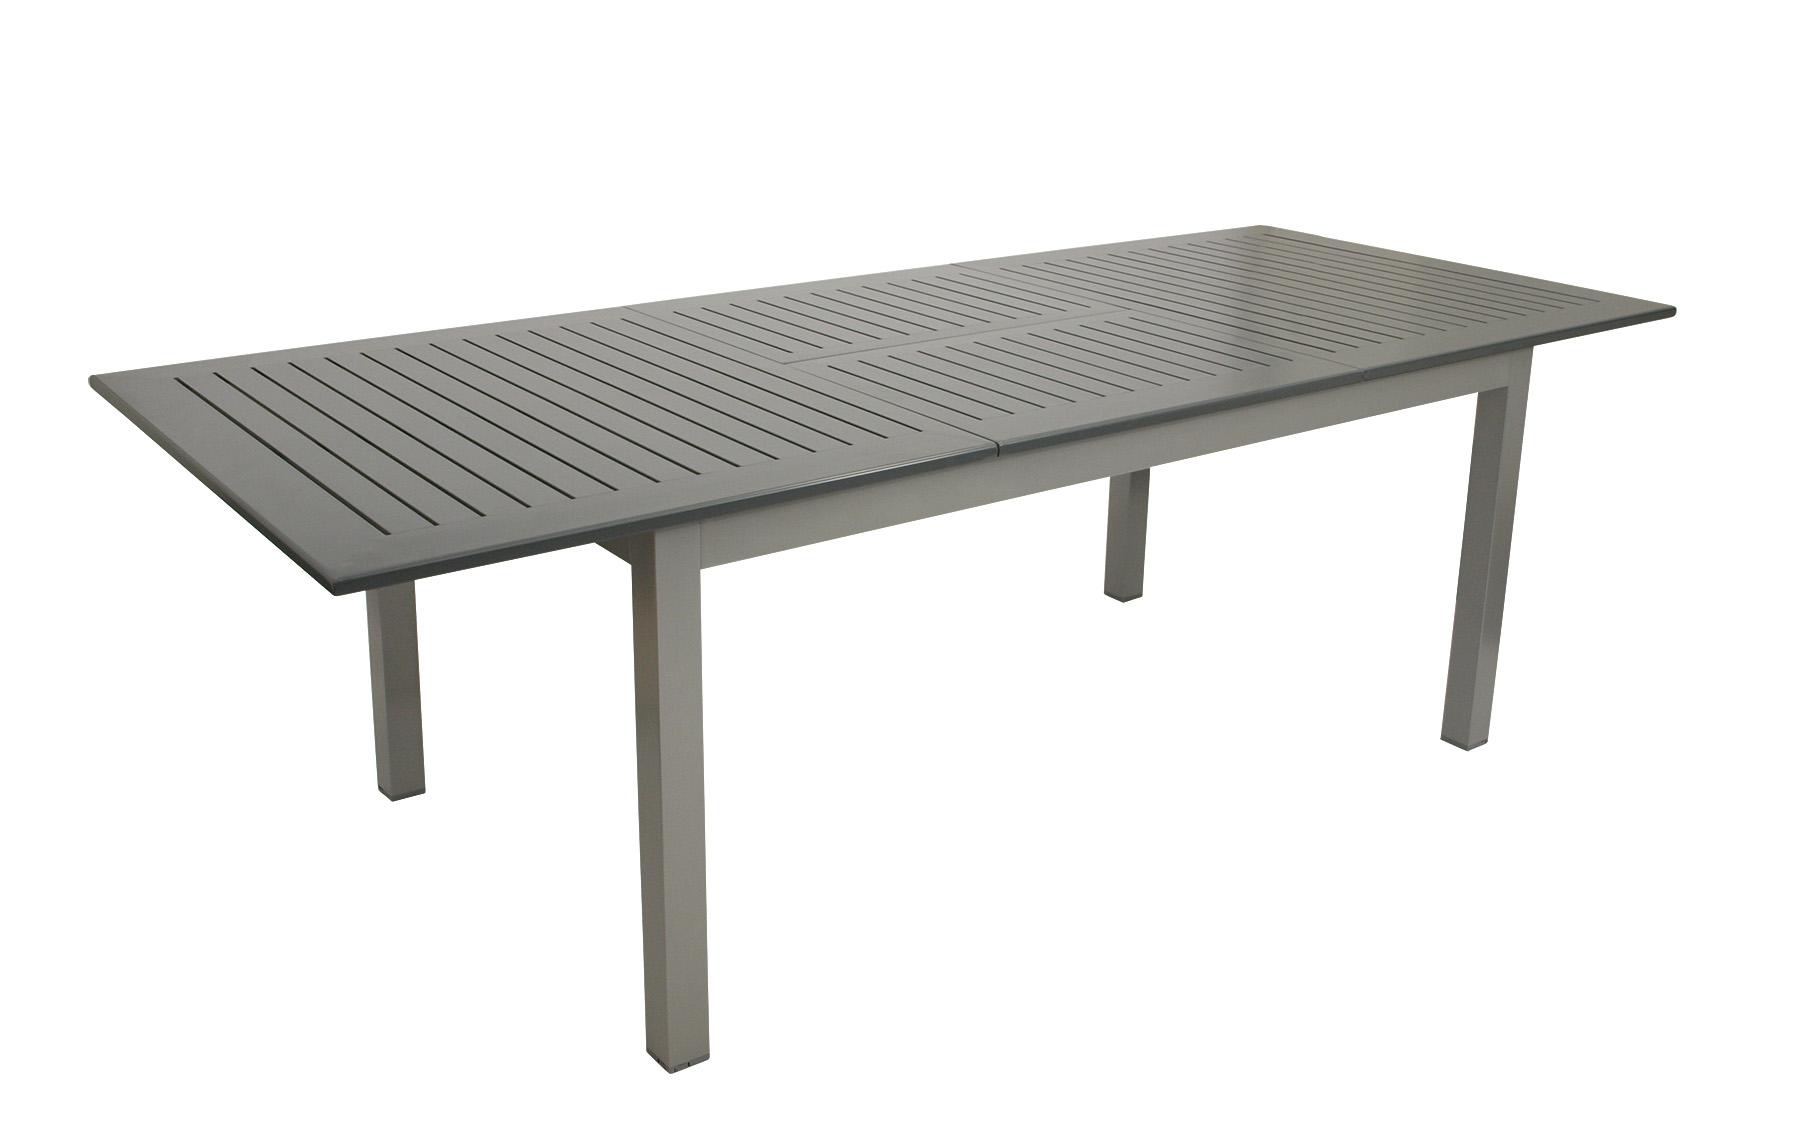 Ausziehtisch BAJAZZO 175/245x100cm, Aluminium grau